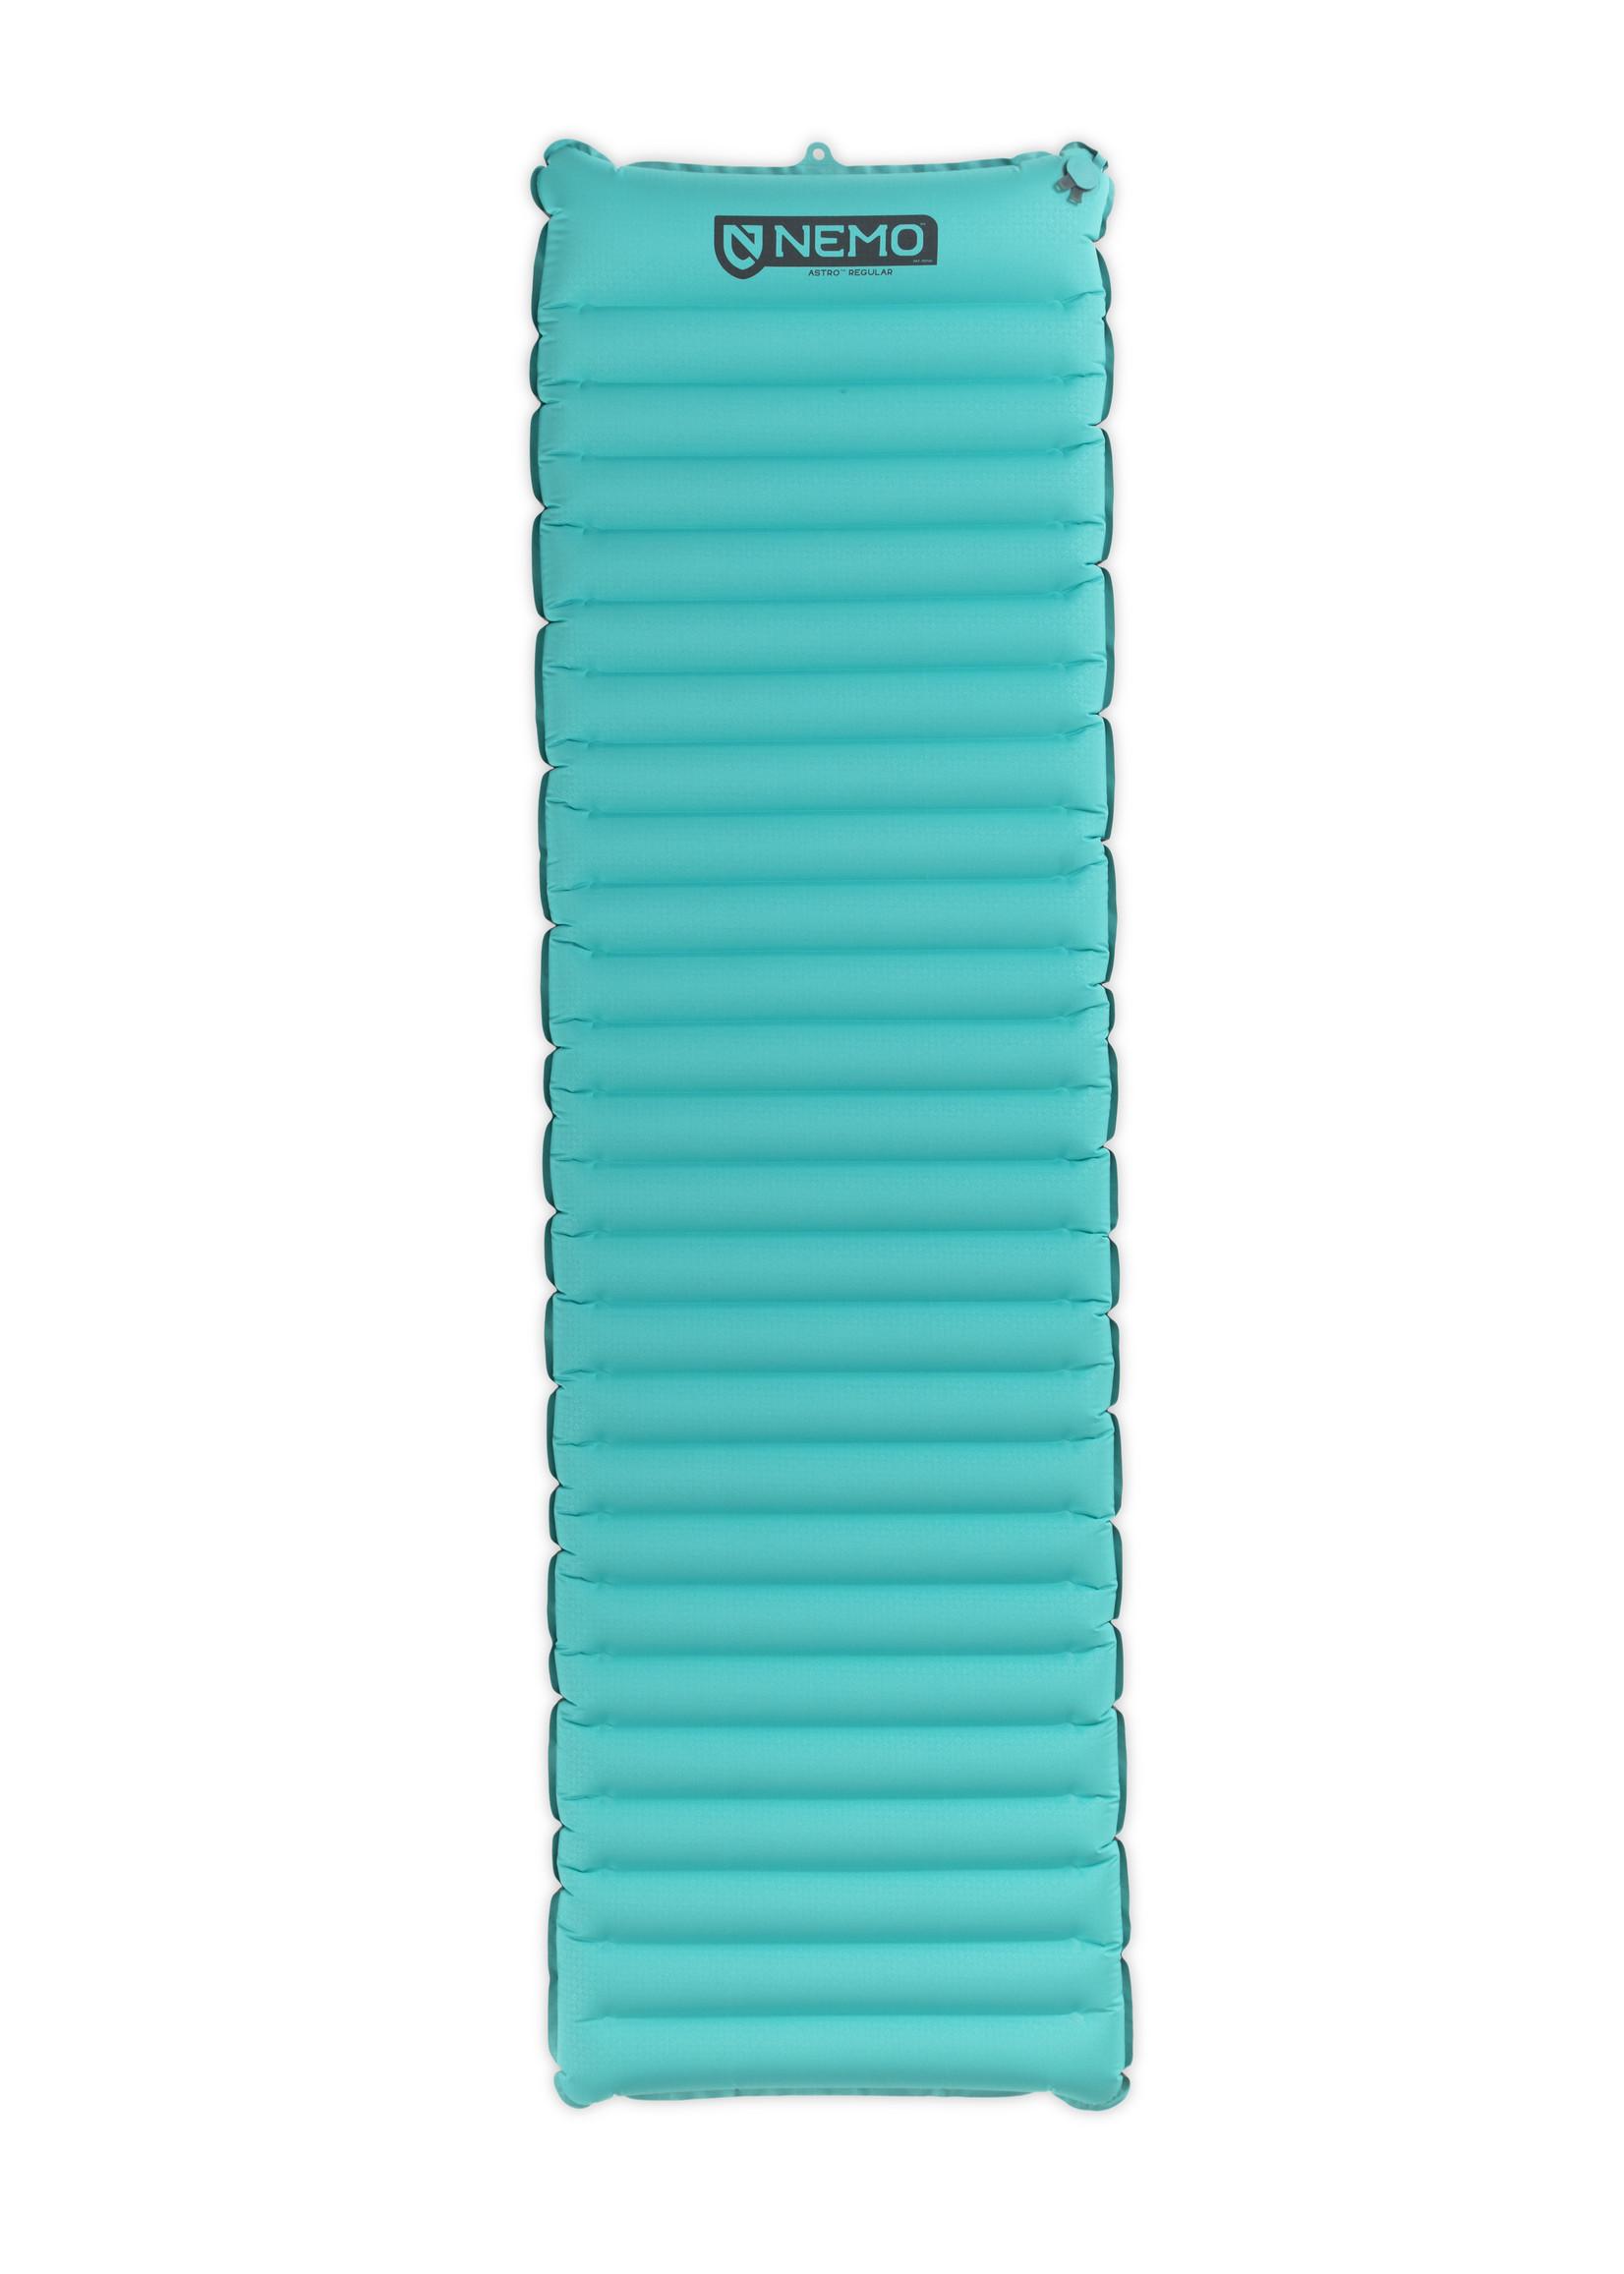 Nemo Astro Regular Sleeping pad